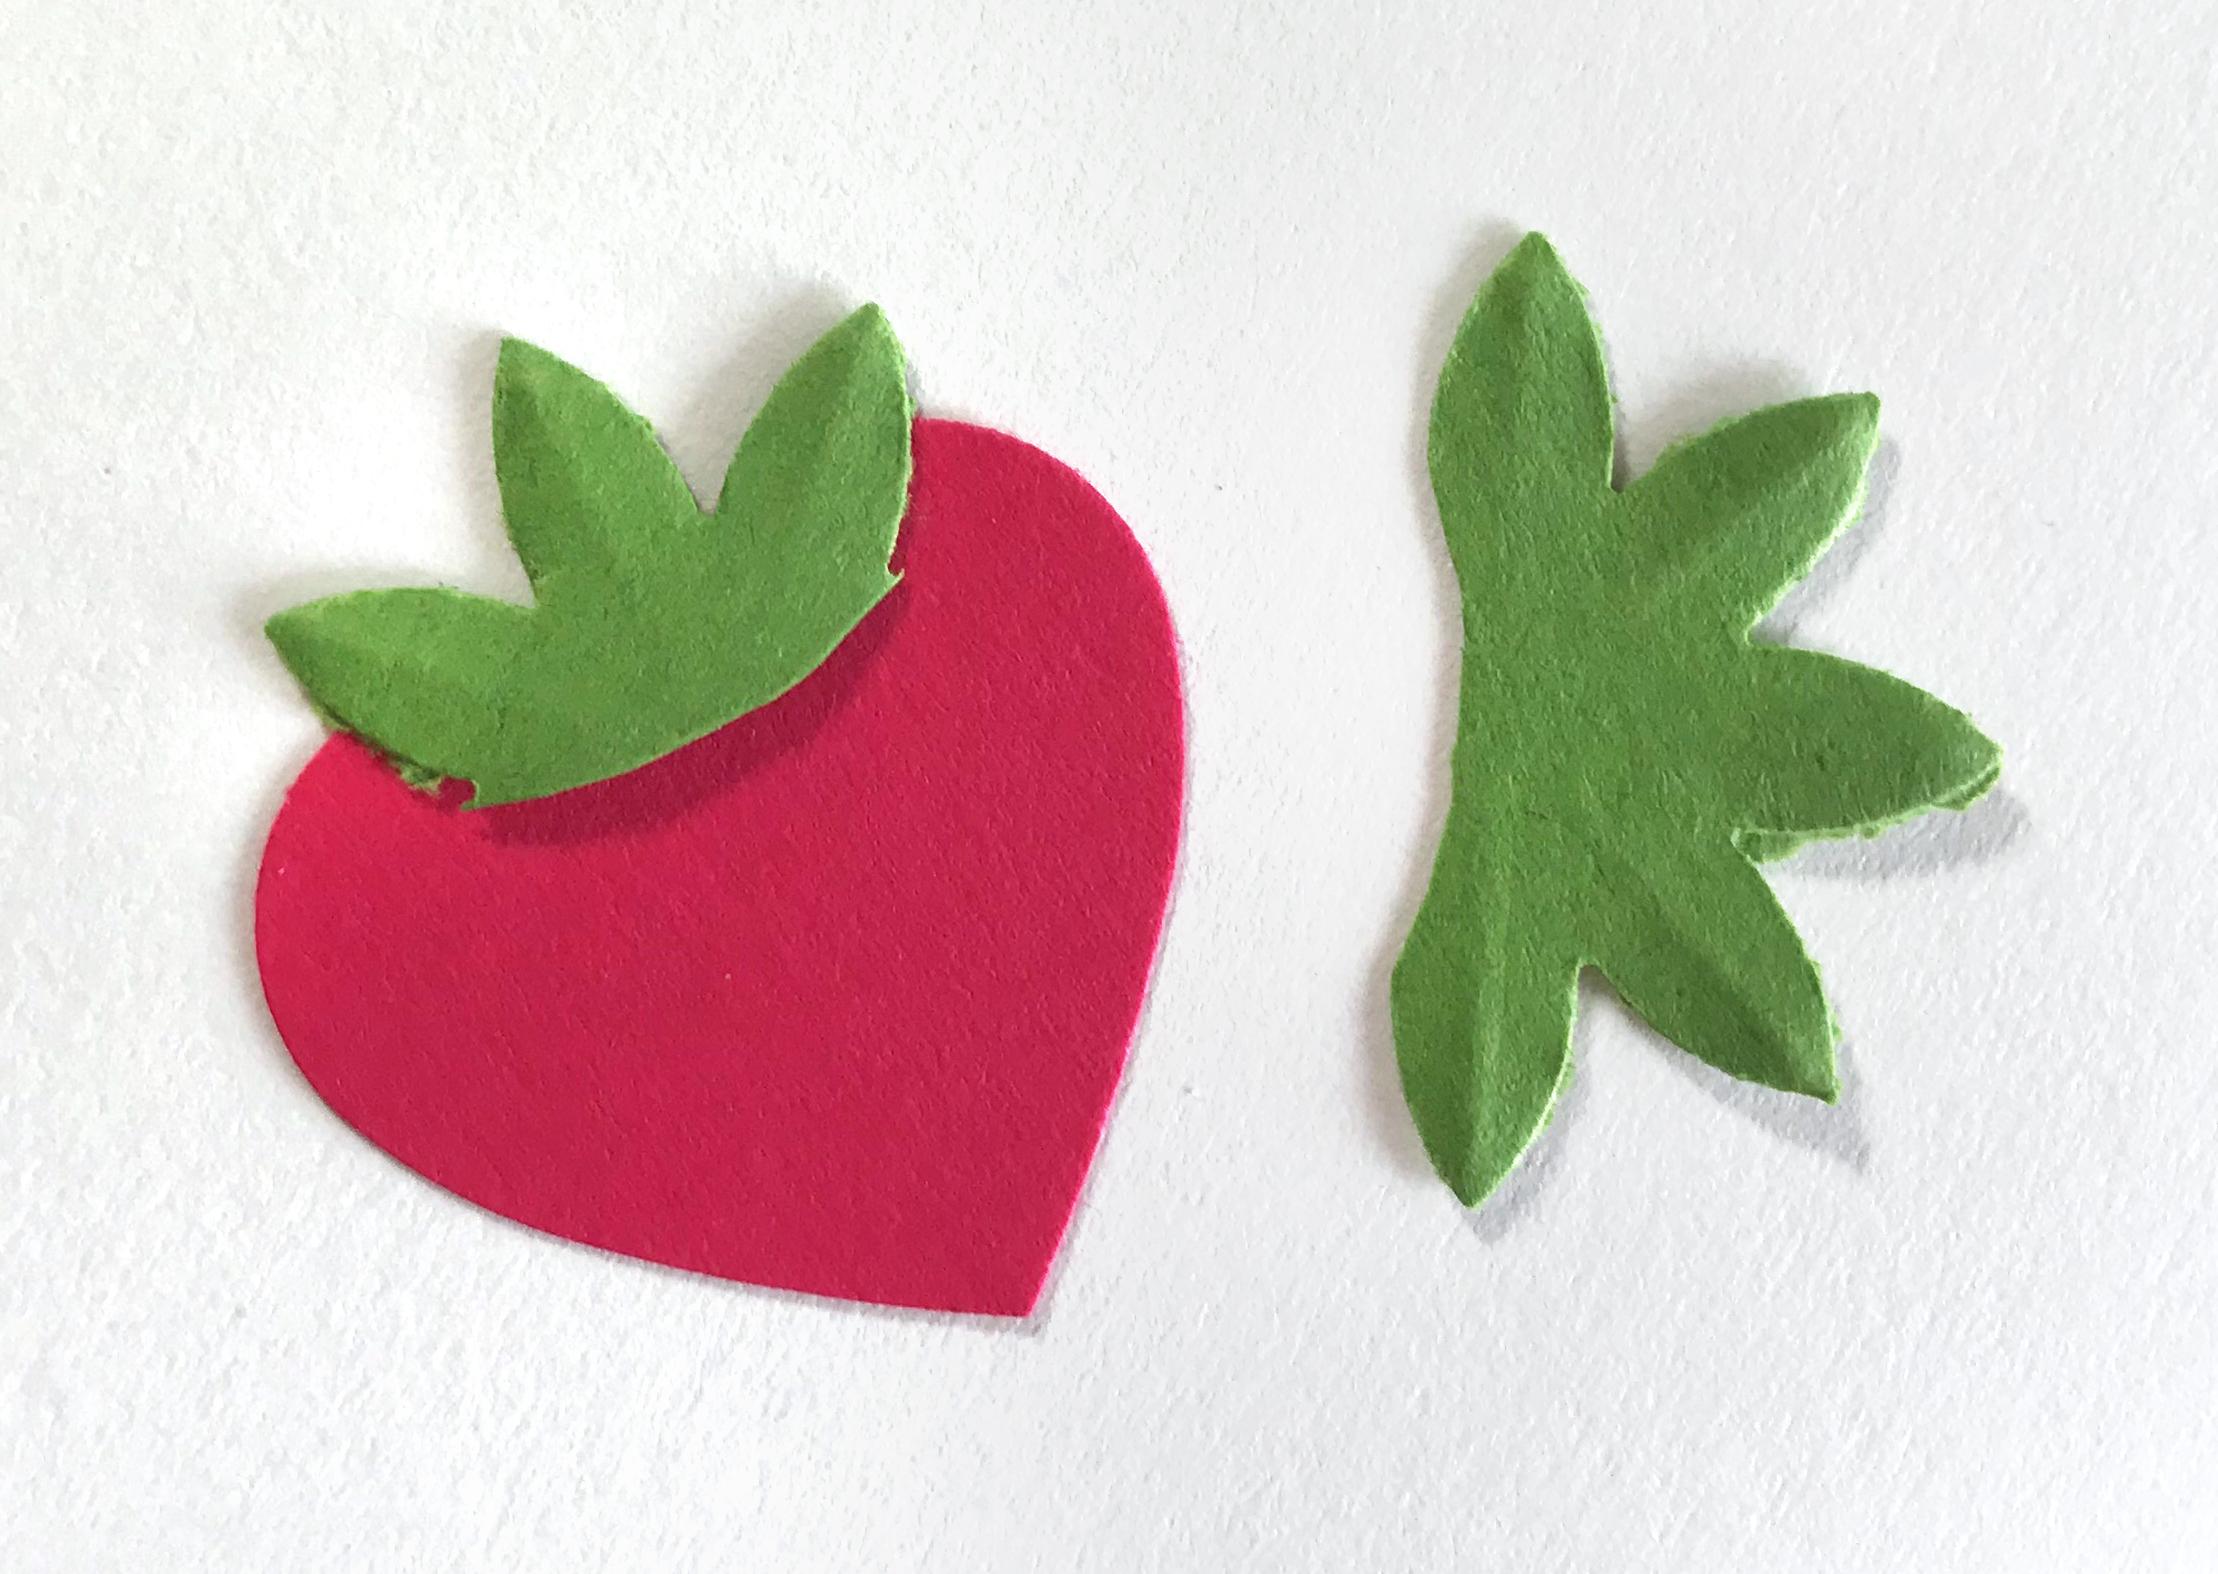 Locally-Grown-Strawberry-Scrapbook-Layout-Process4-Creative-Memories